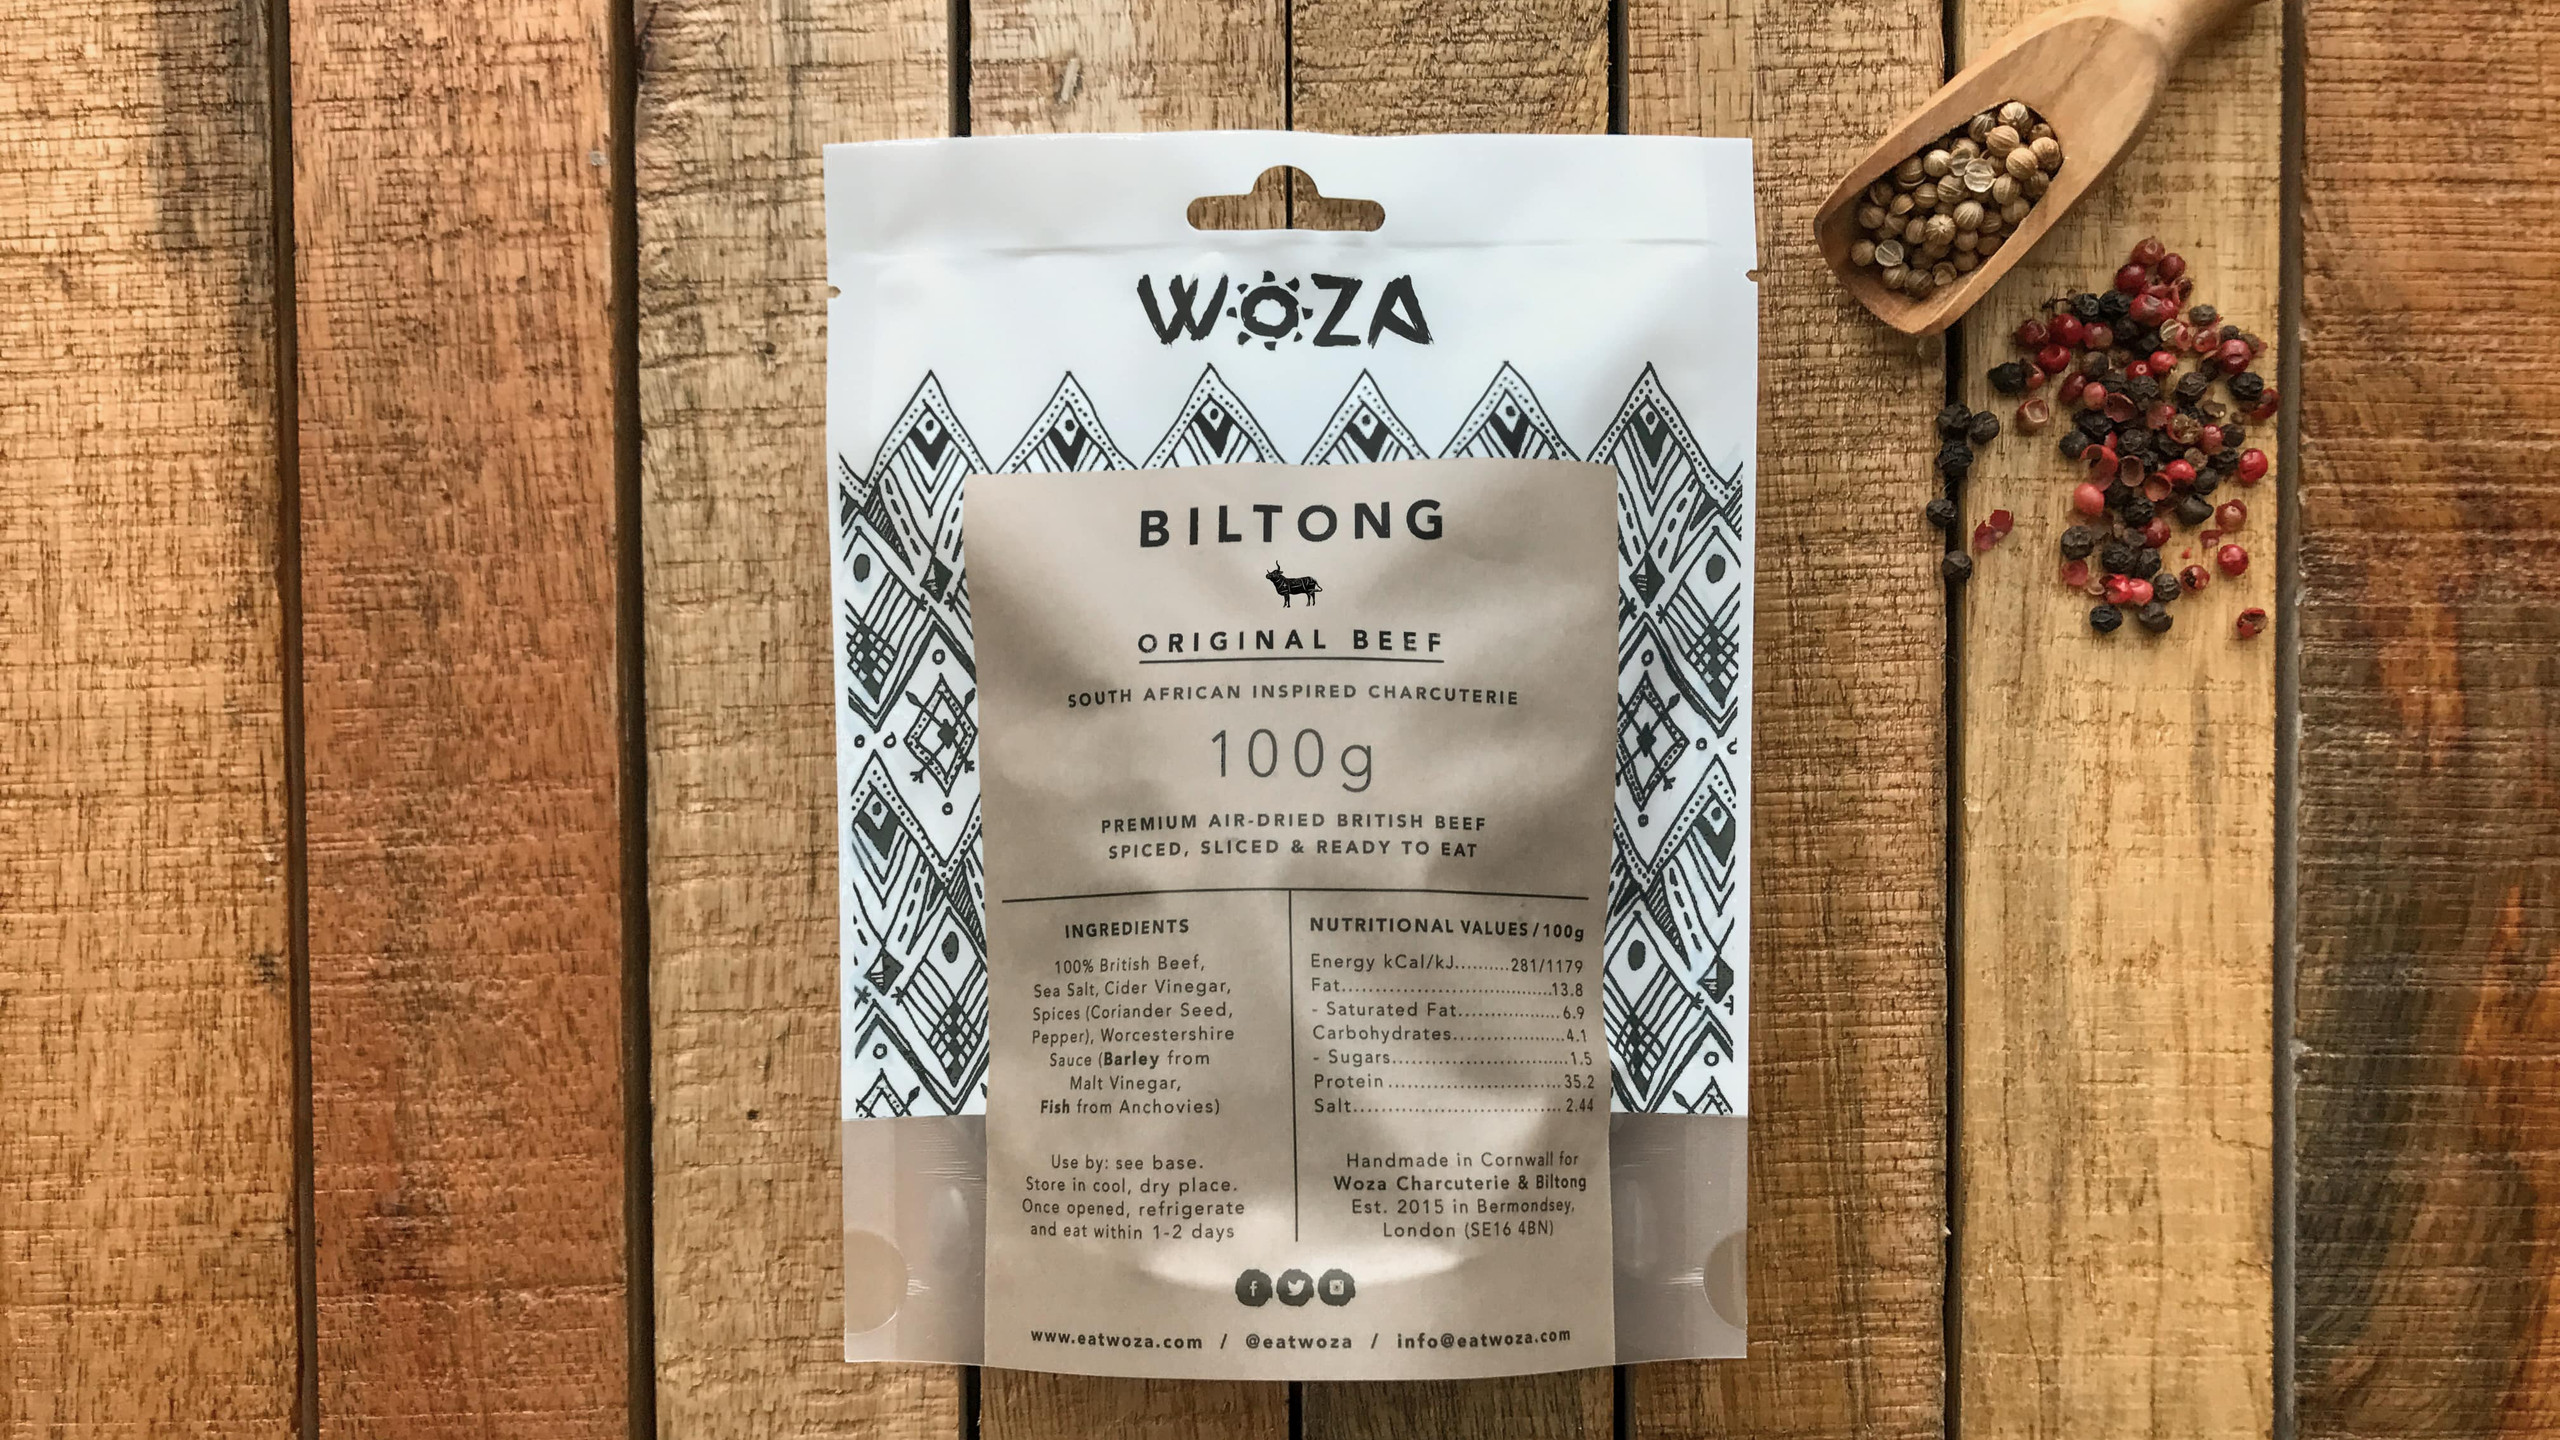 Original Beef Biltong by Woza